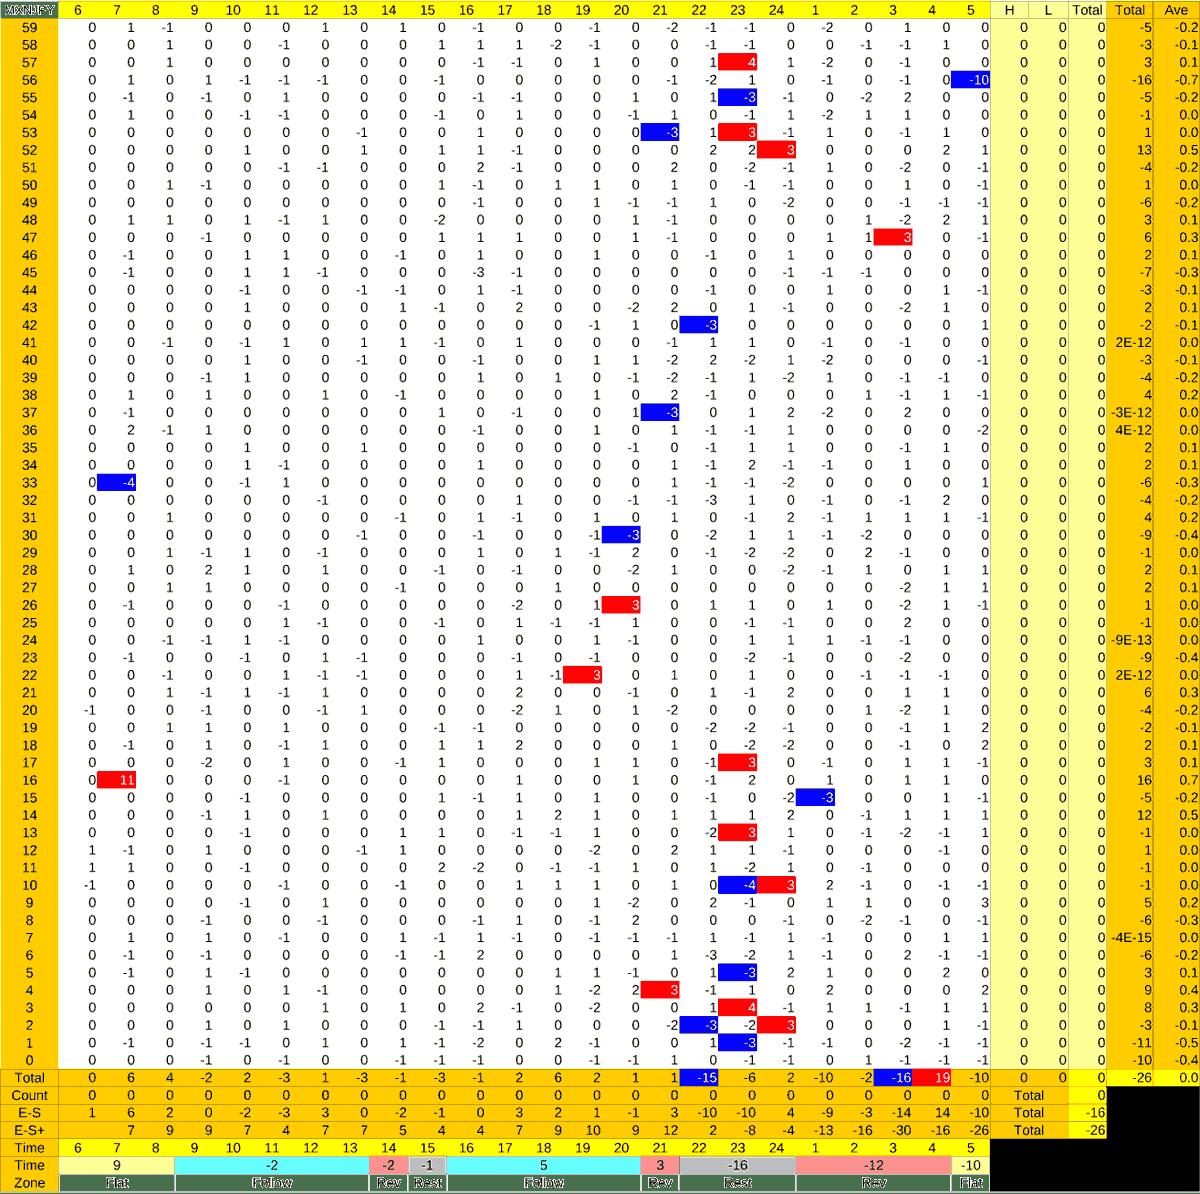 20210405_HS(3)MXNJPY